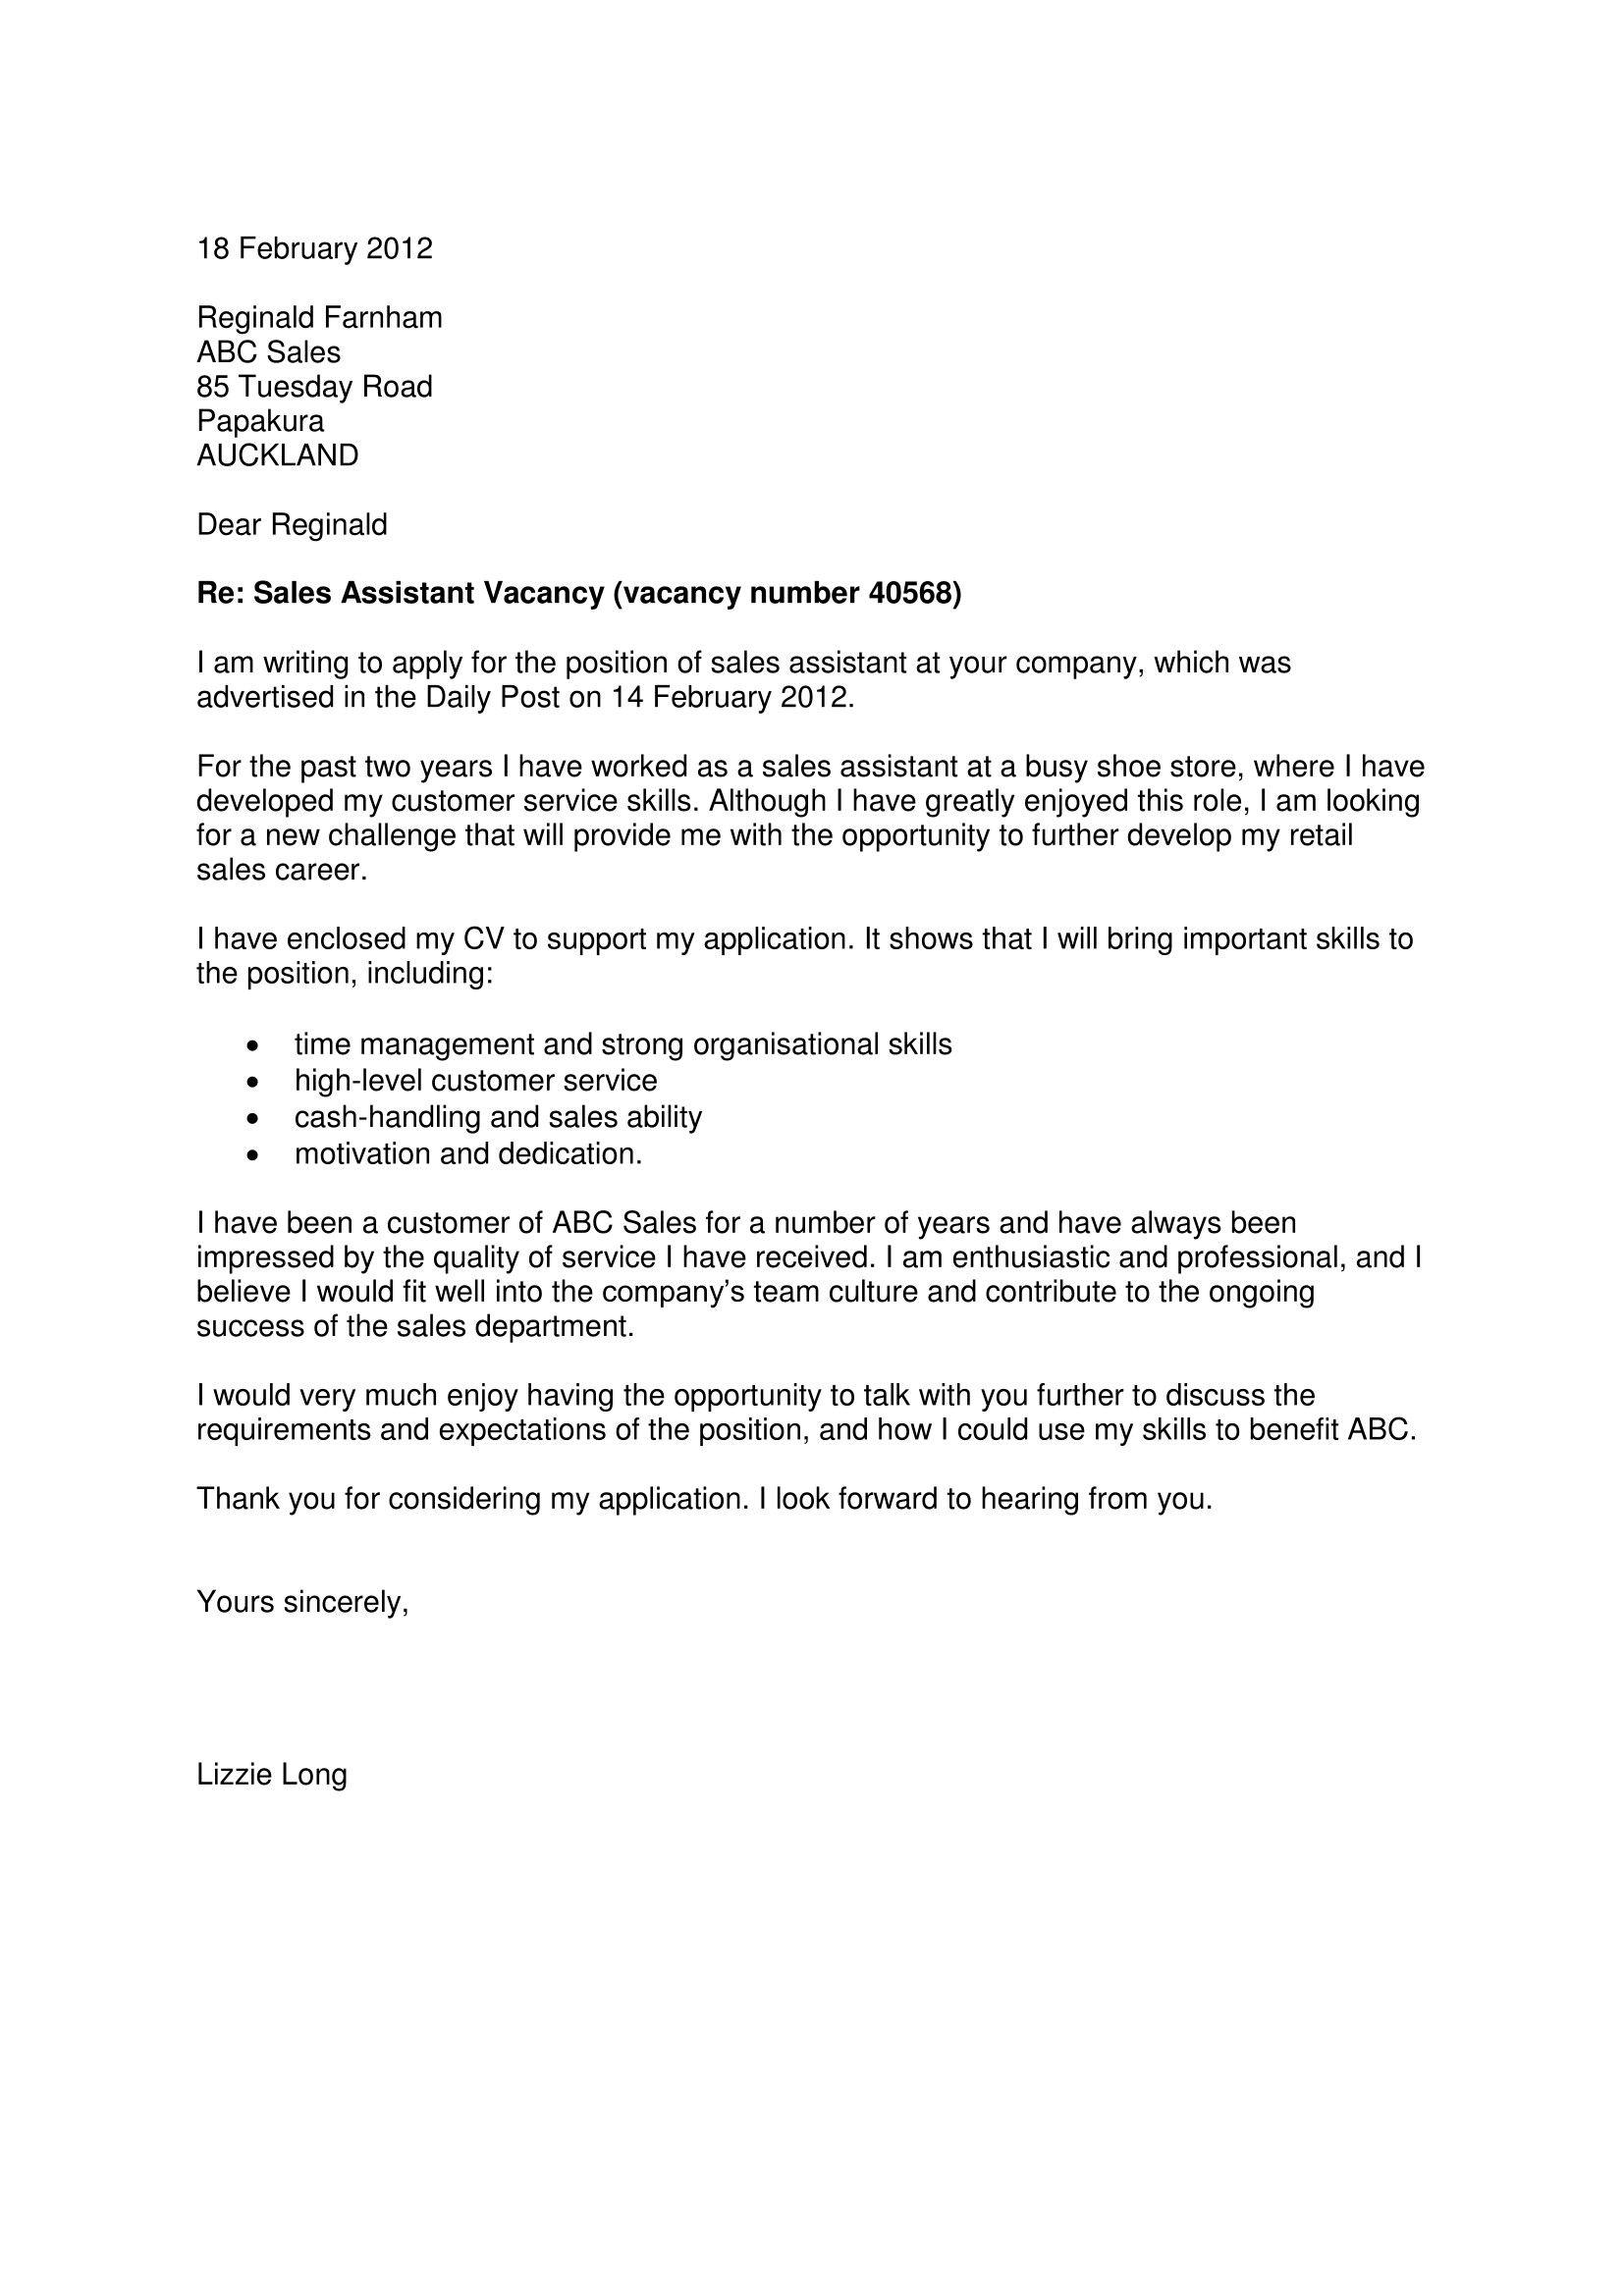 job application cover letter nz